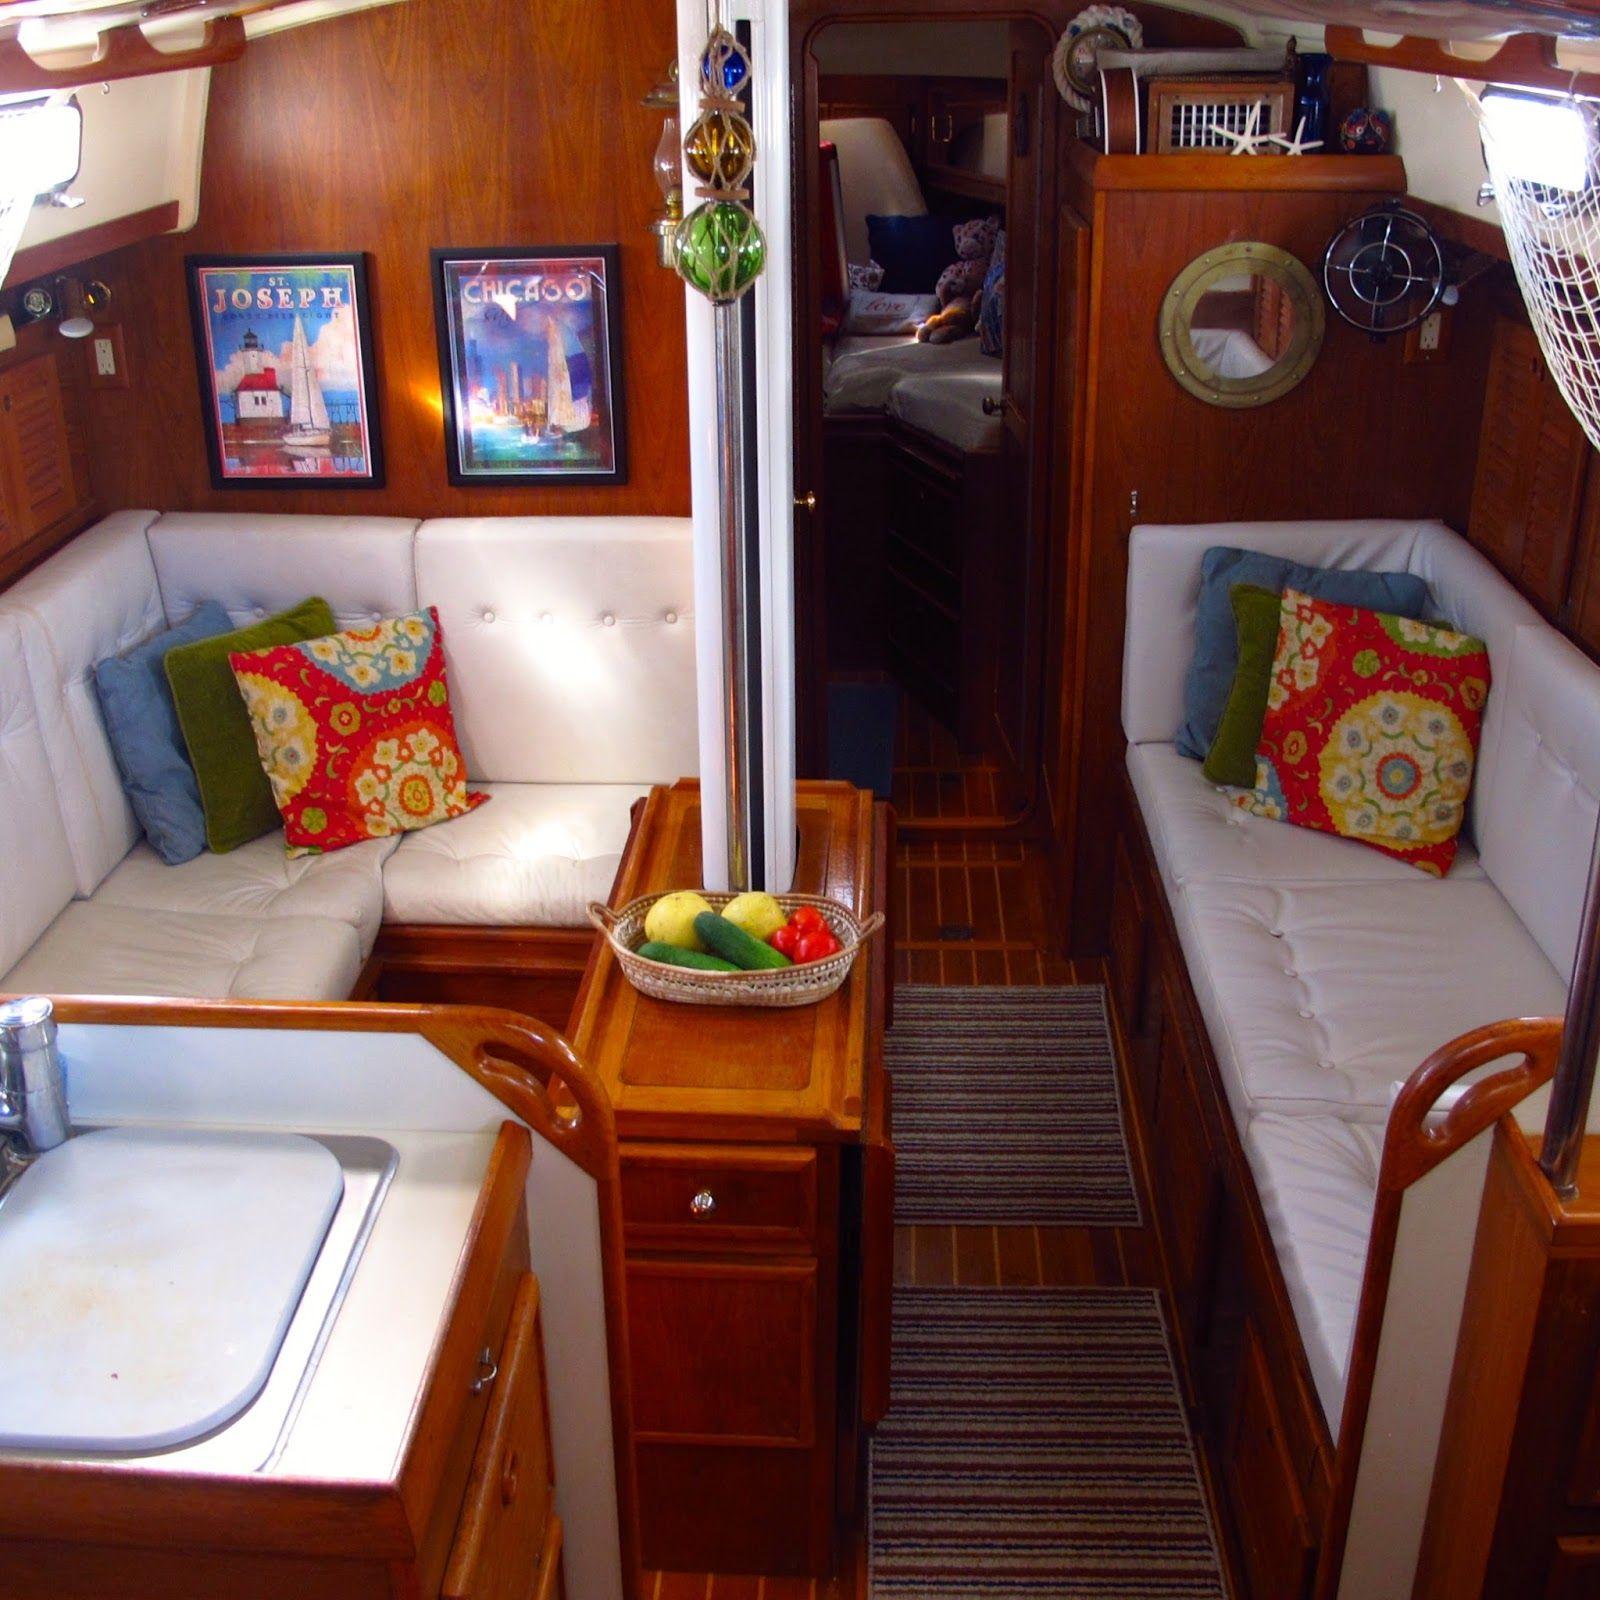 httpss media cache ak0pinimgcomoriginals3d - Boat Interior Design Ideas